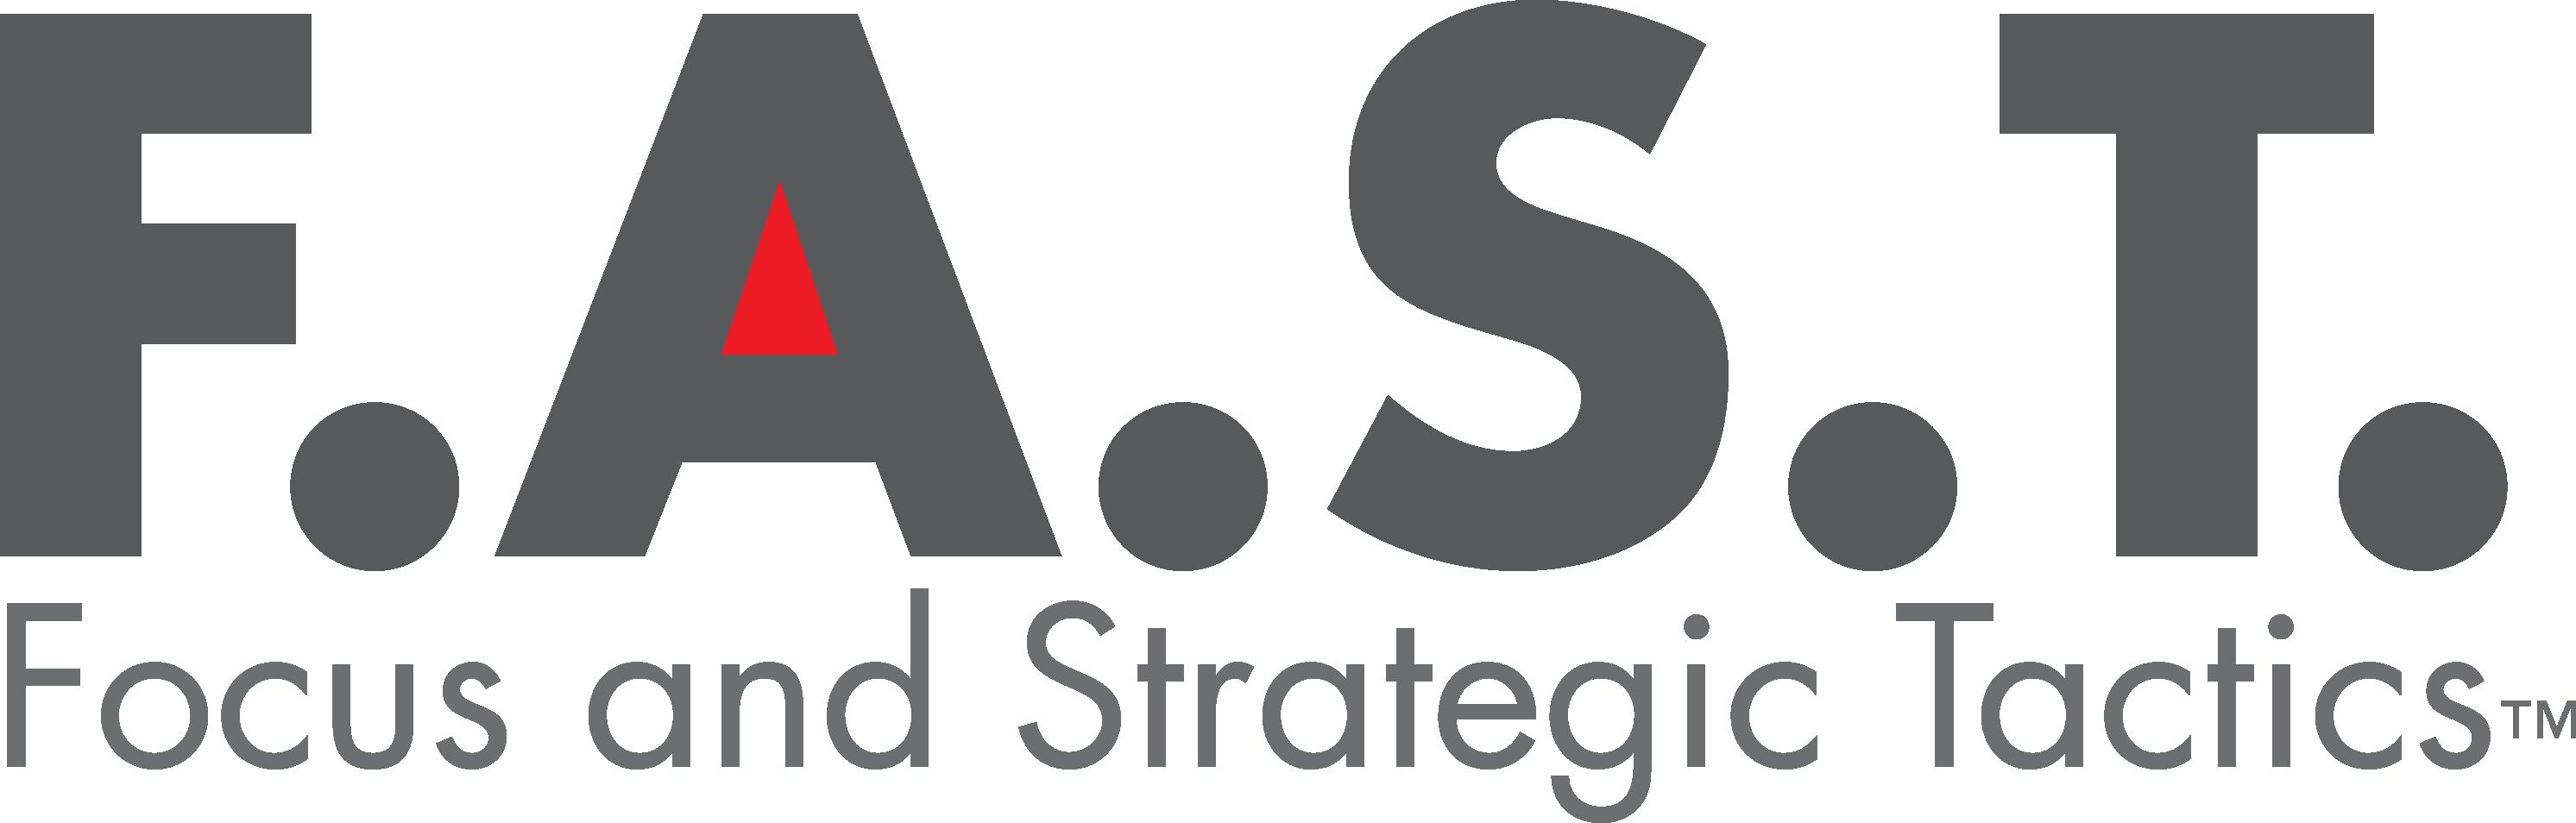 FAST.Logo